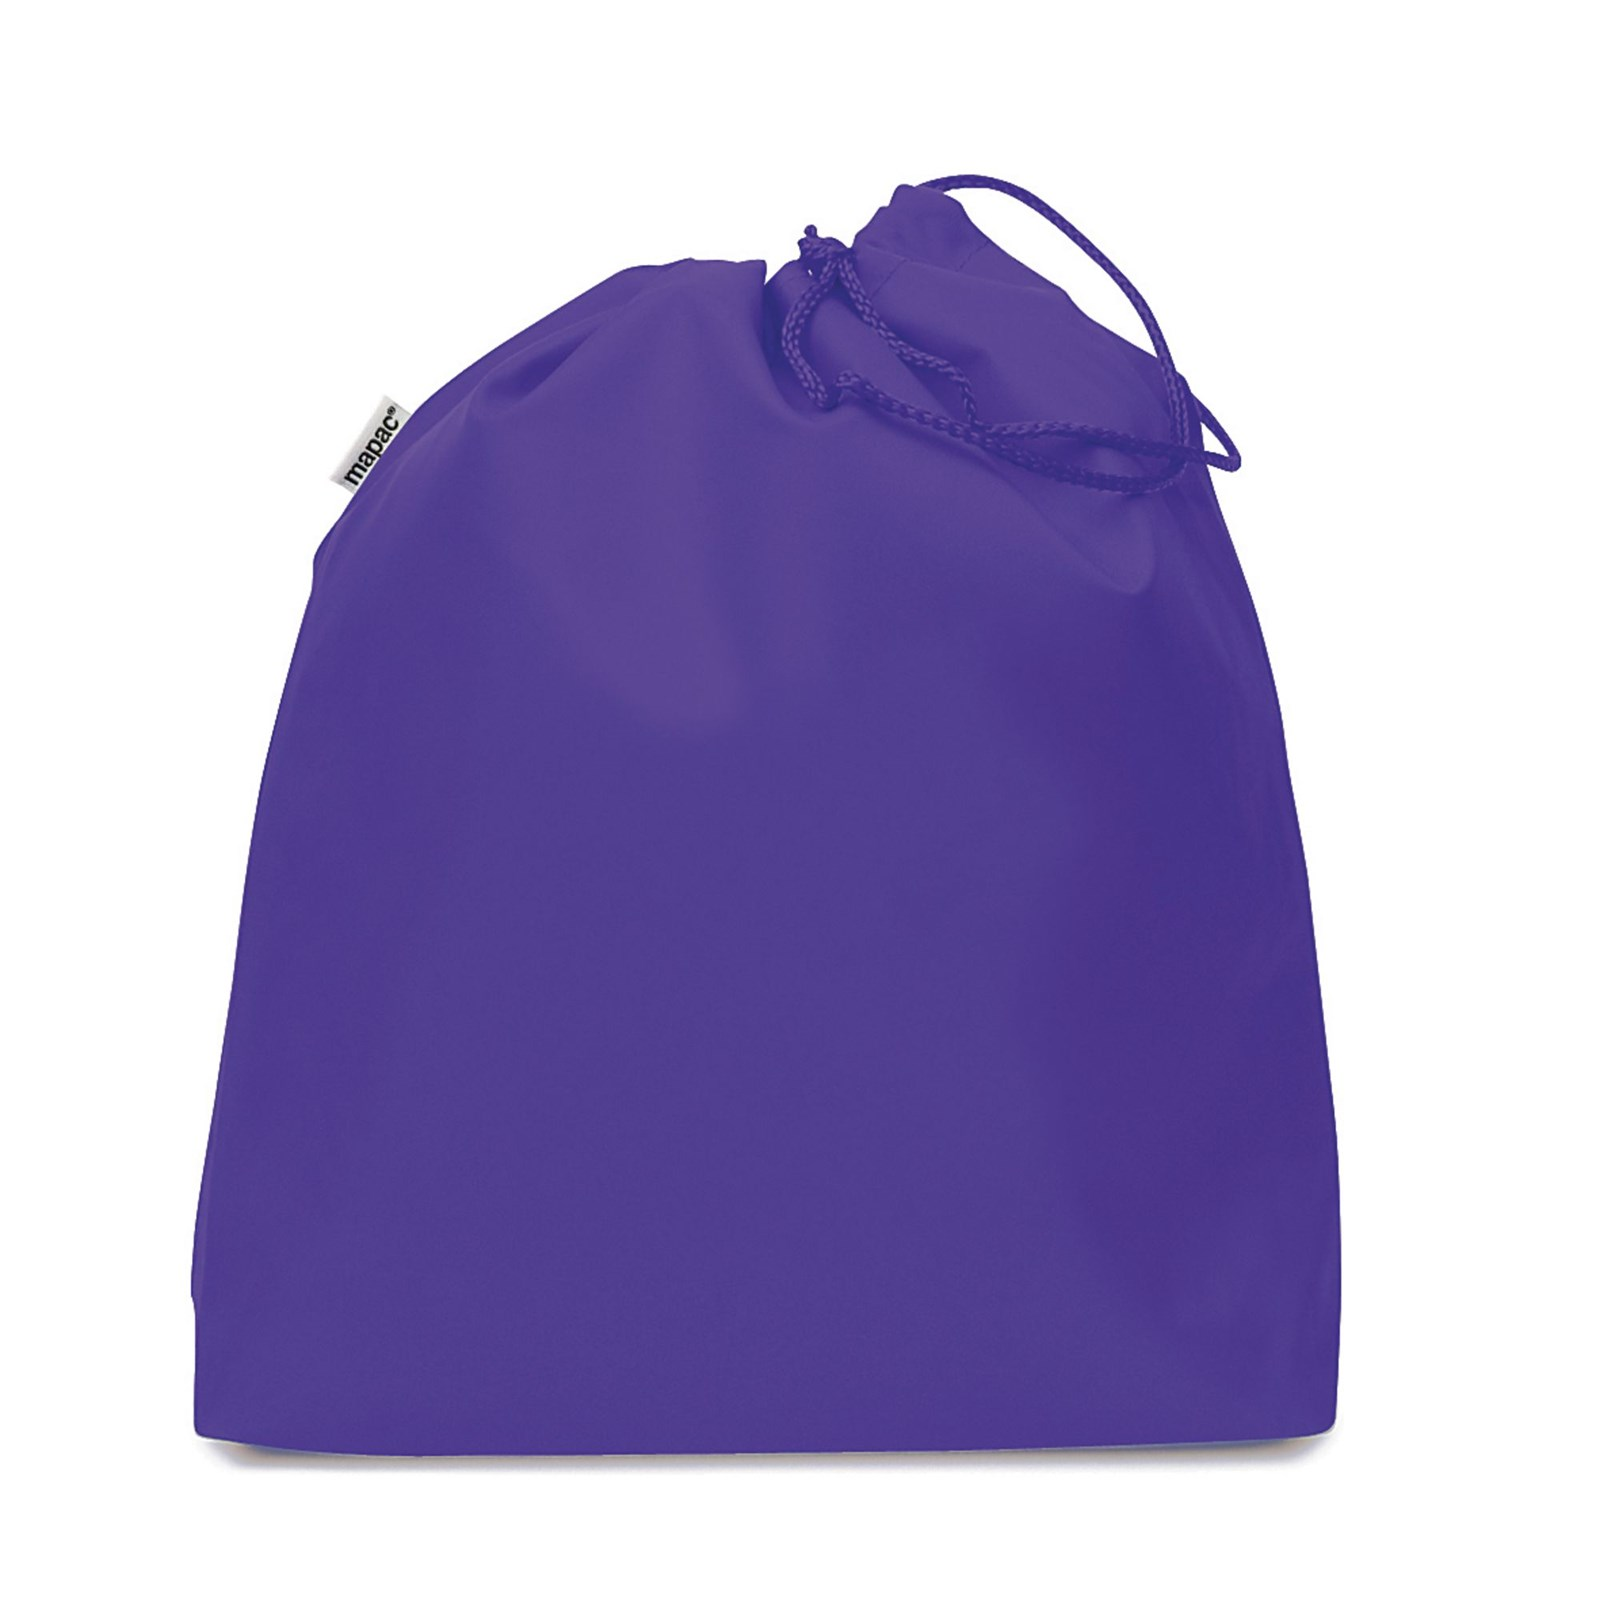 Plain Gym Bag Purple - Pack of 25